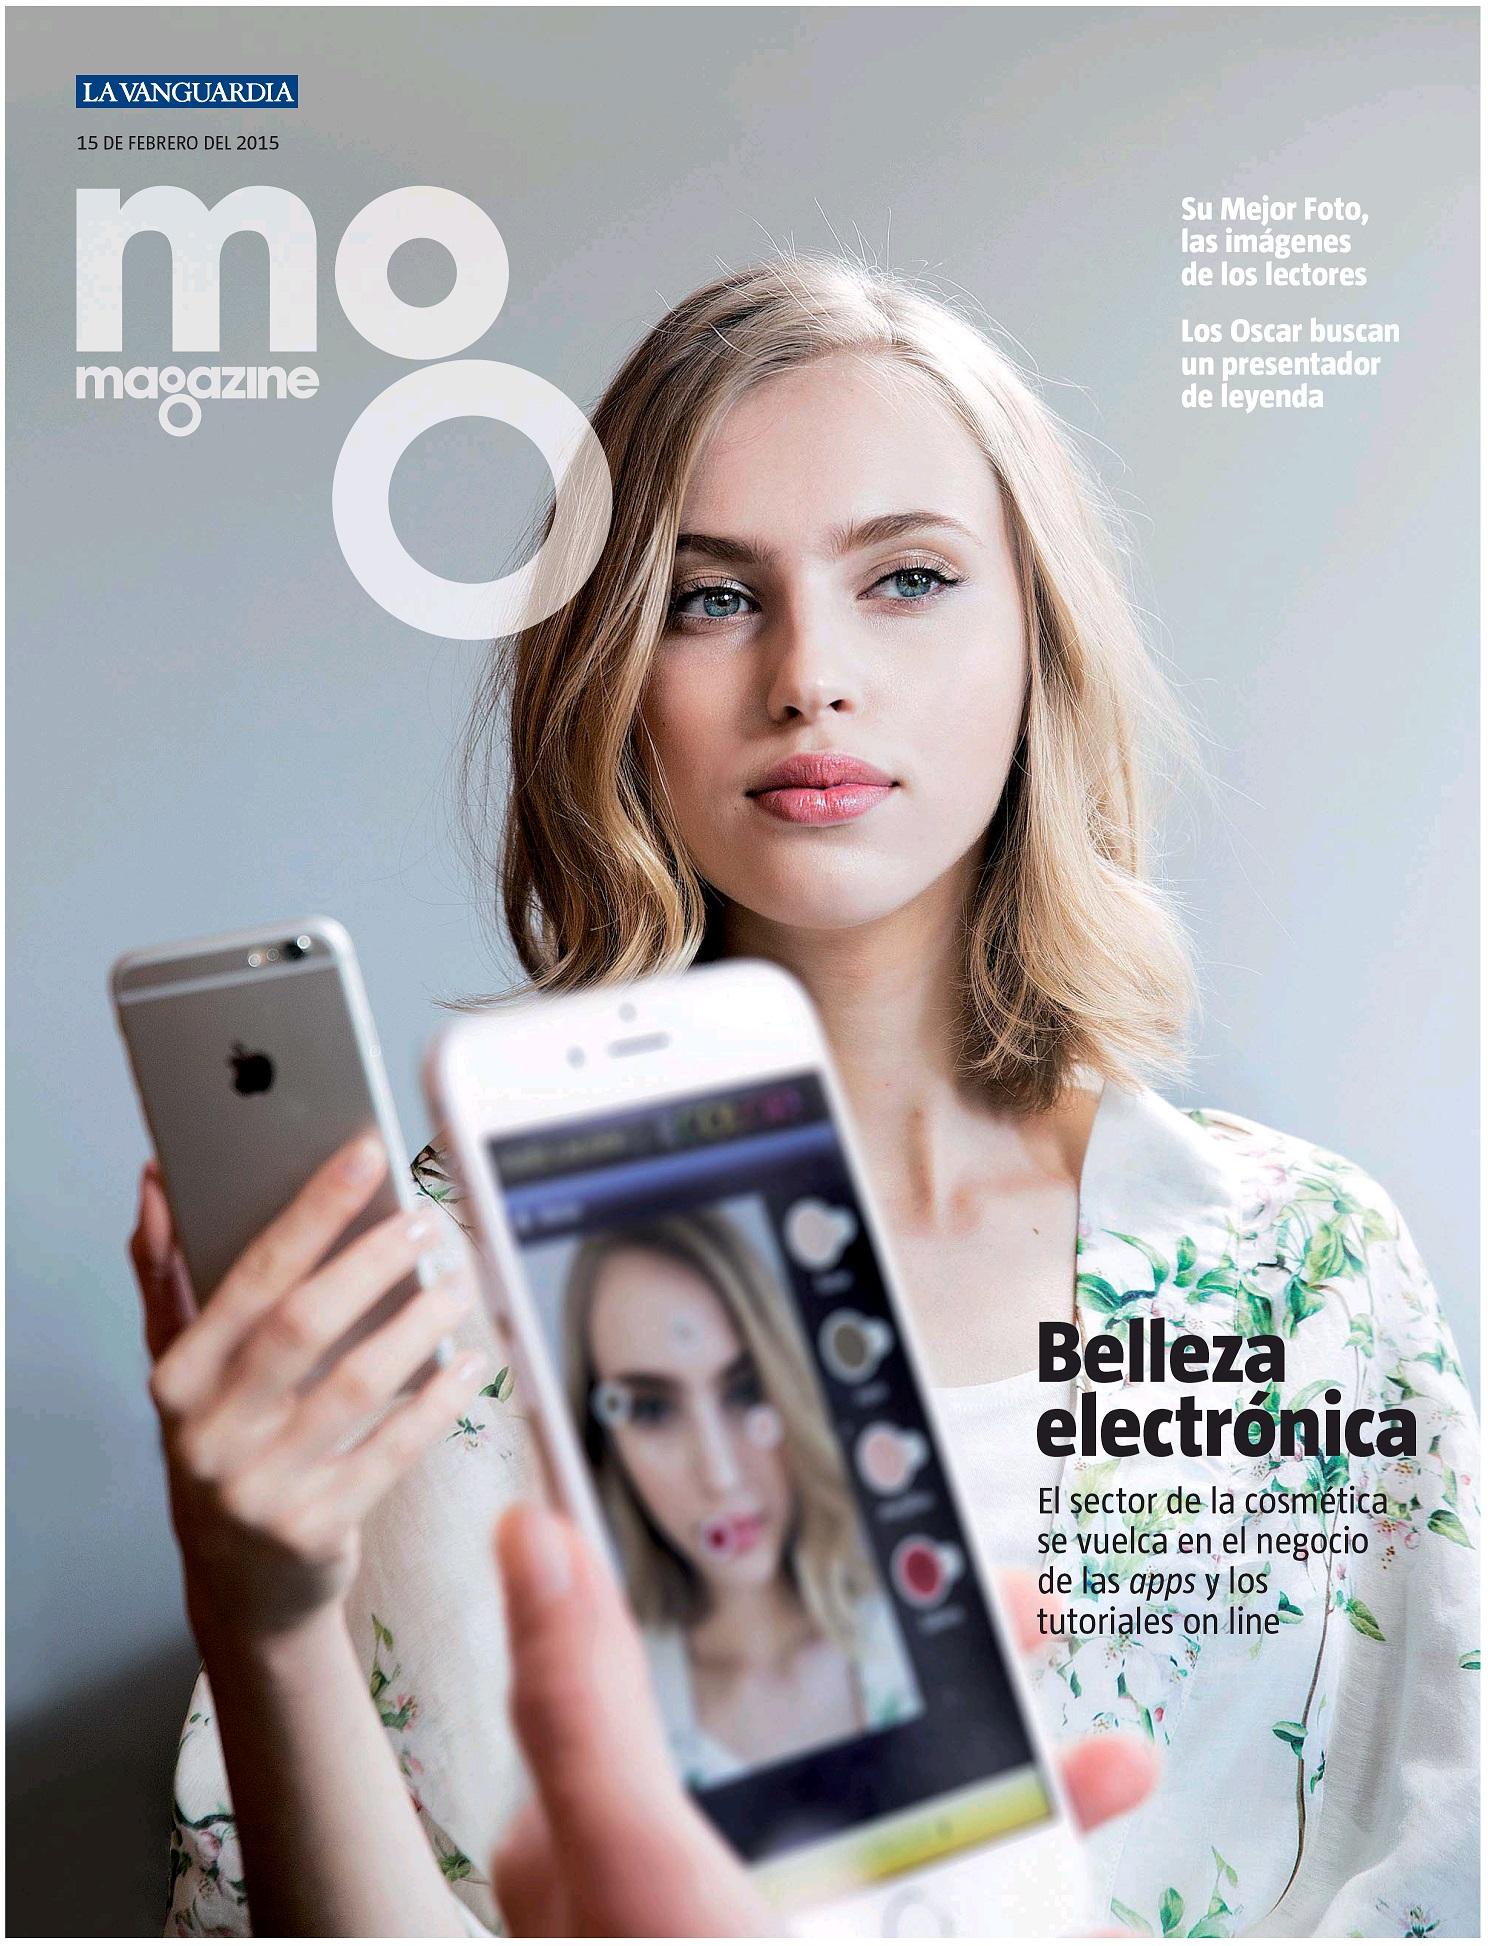 MEGAZINE portada 15 de Febrero 2015